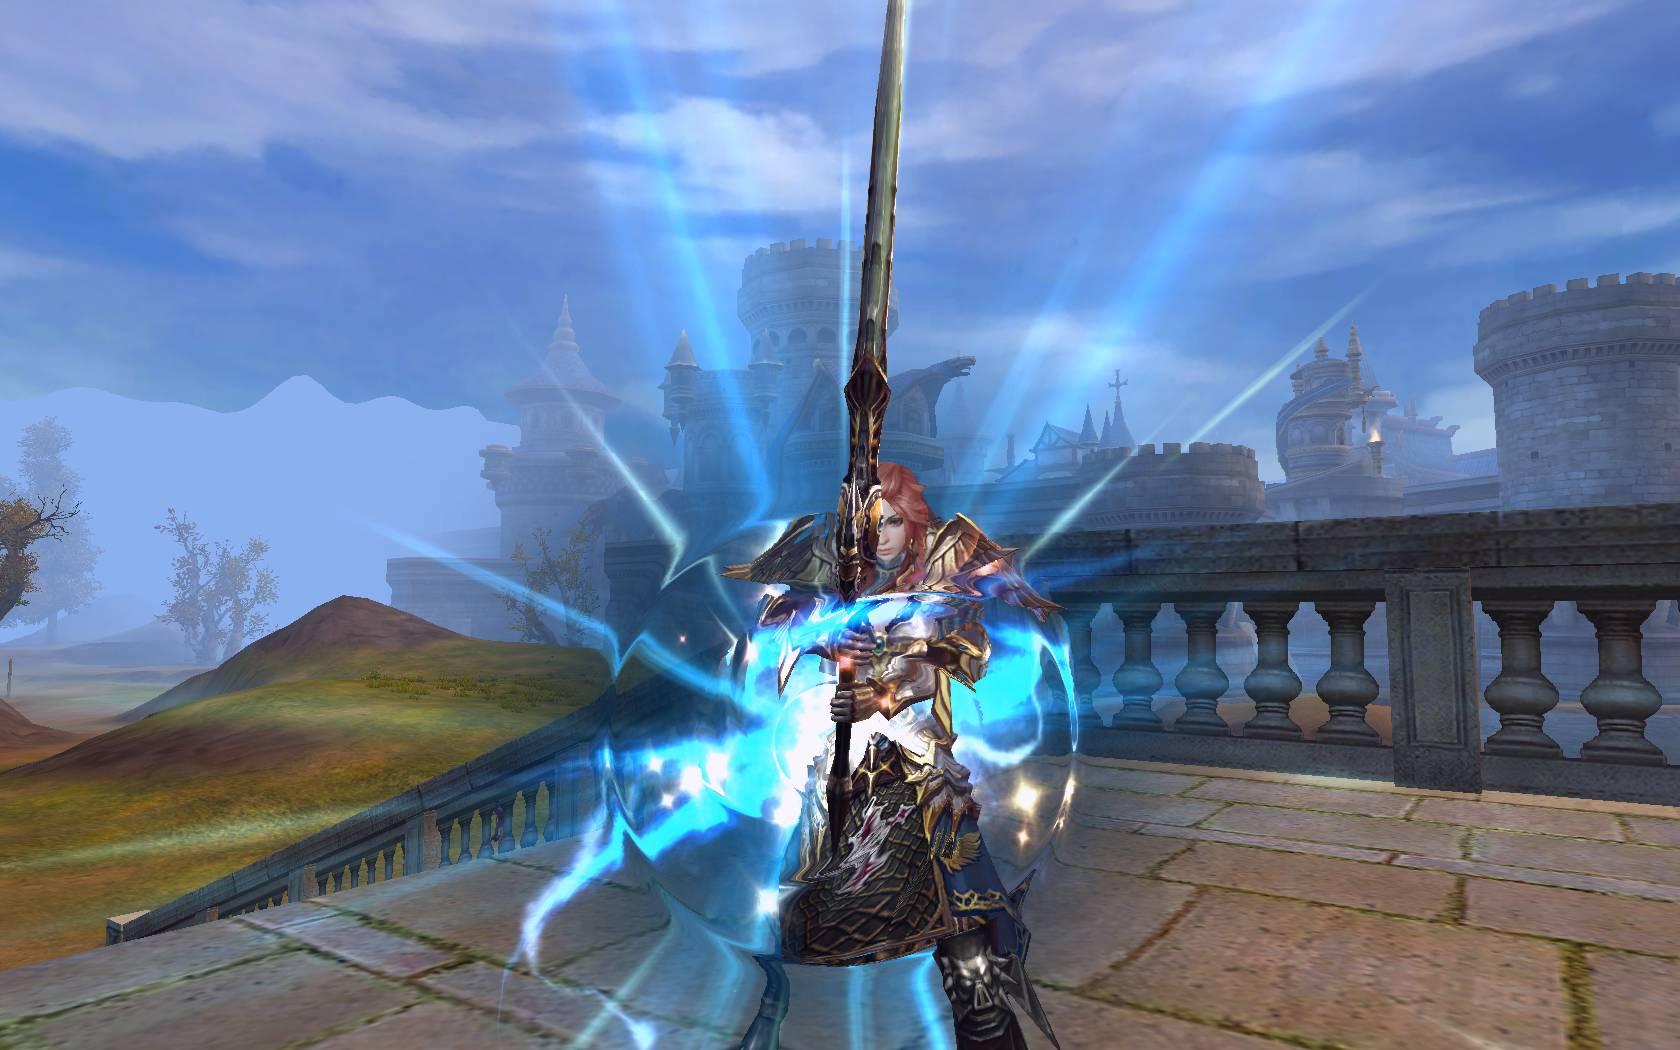 Click image for larger version.Name: Warriorclass Forsaken World03.jpgViews: 171Size: 162.0 KBID: 1059